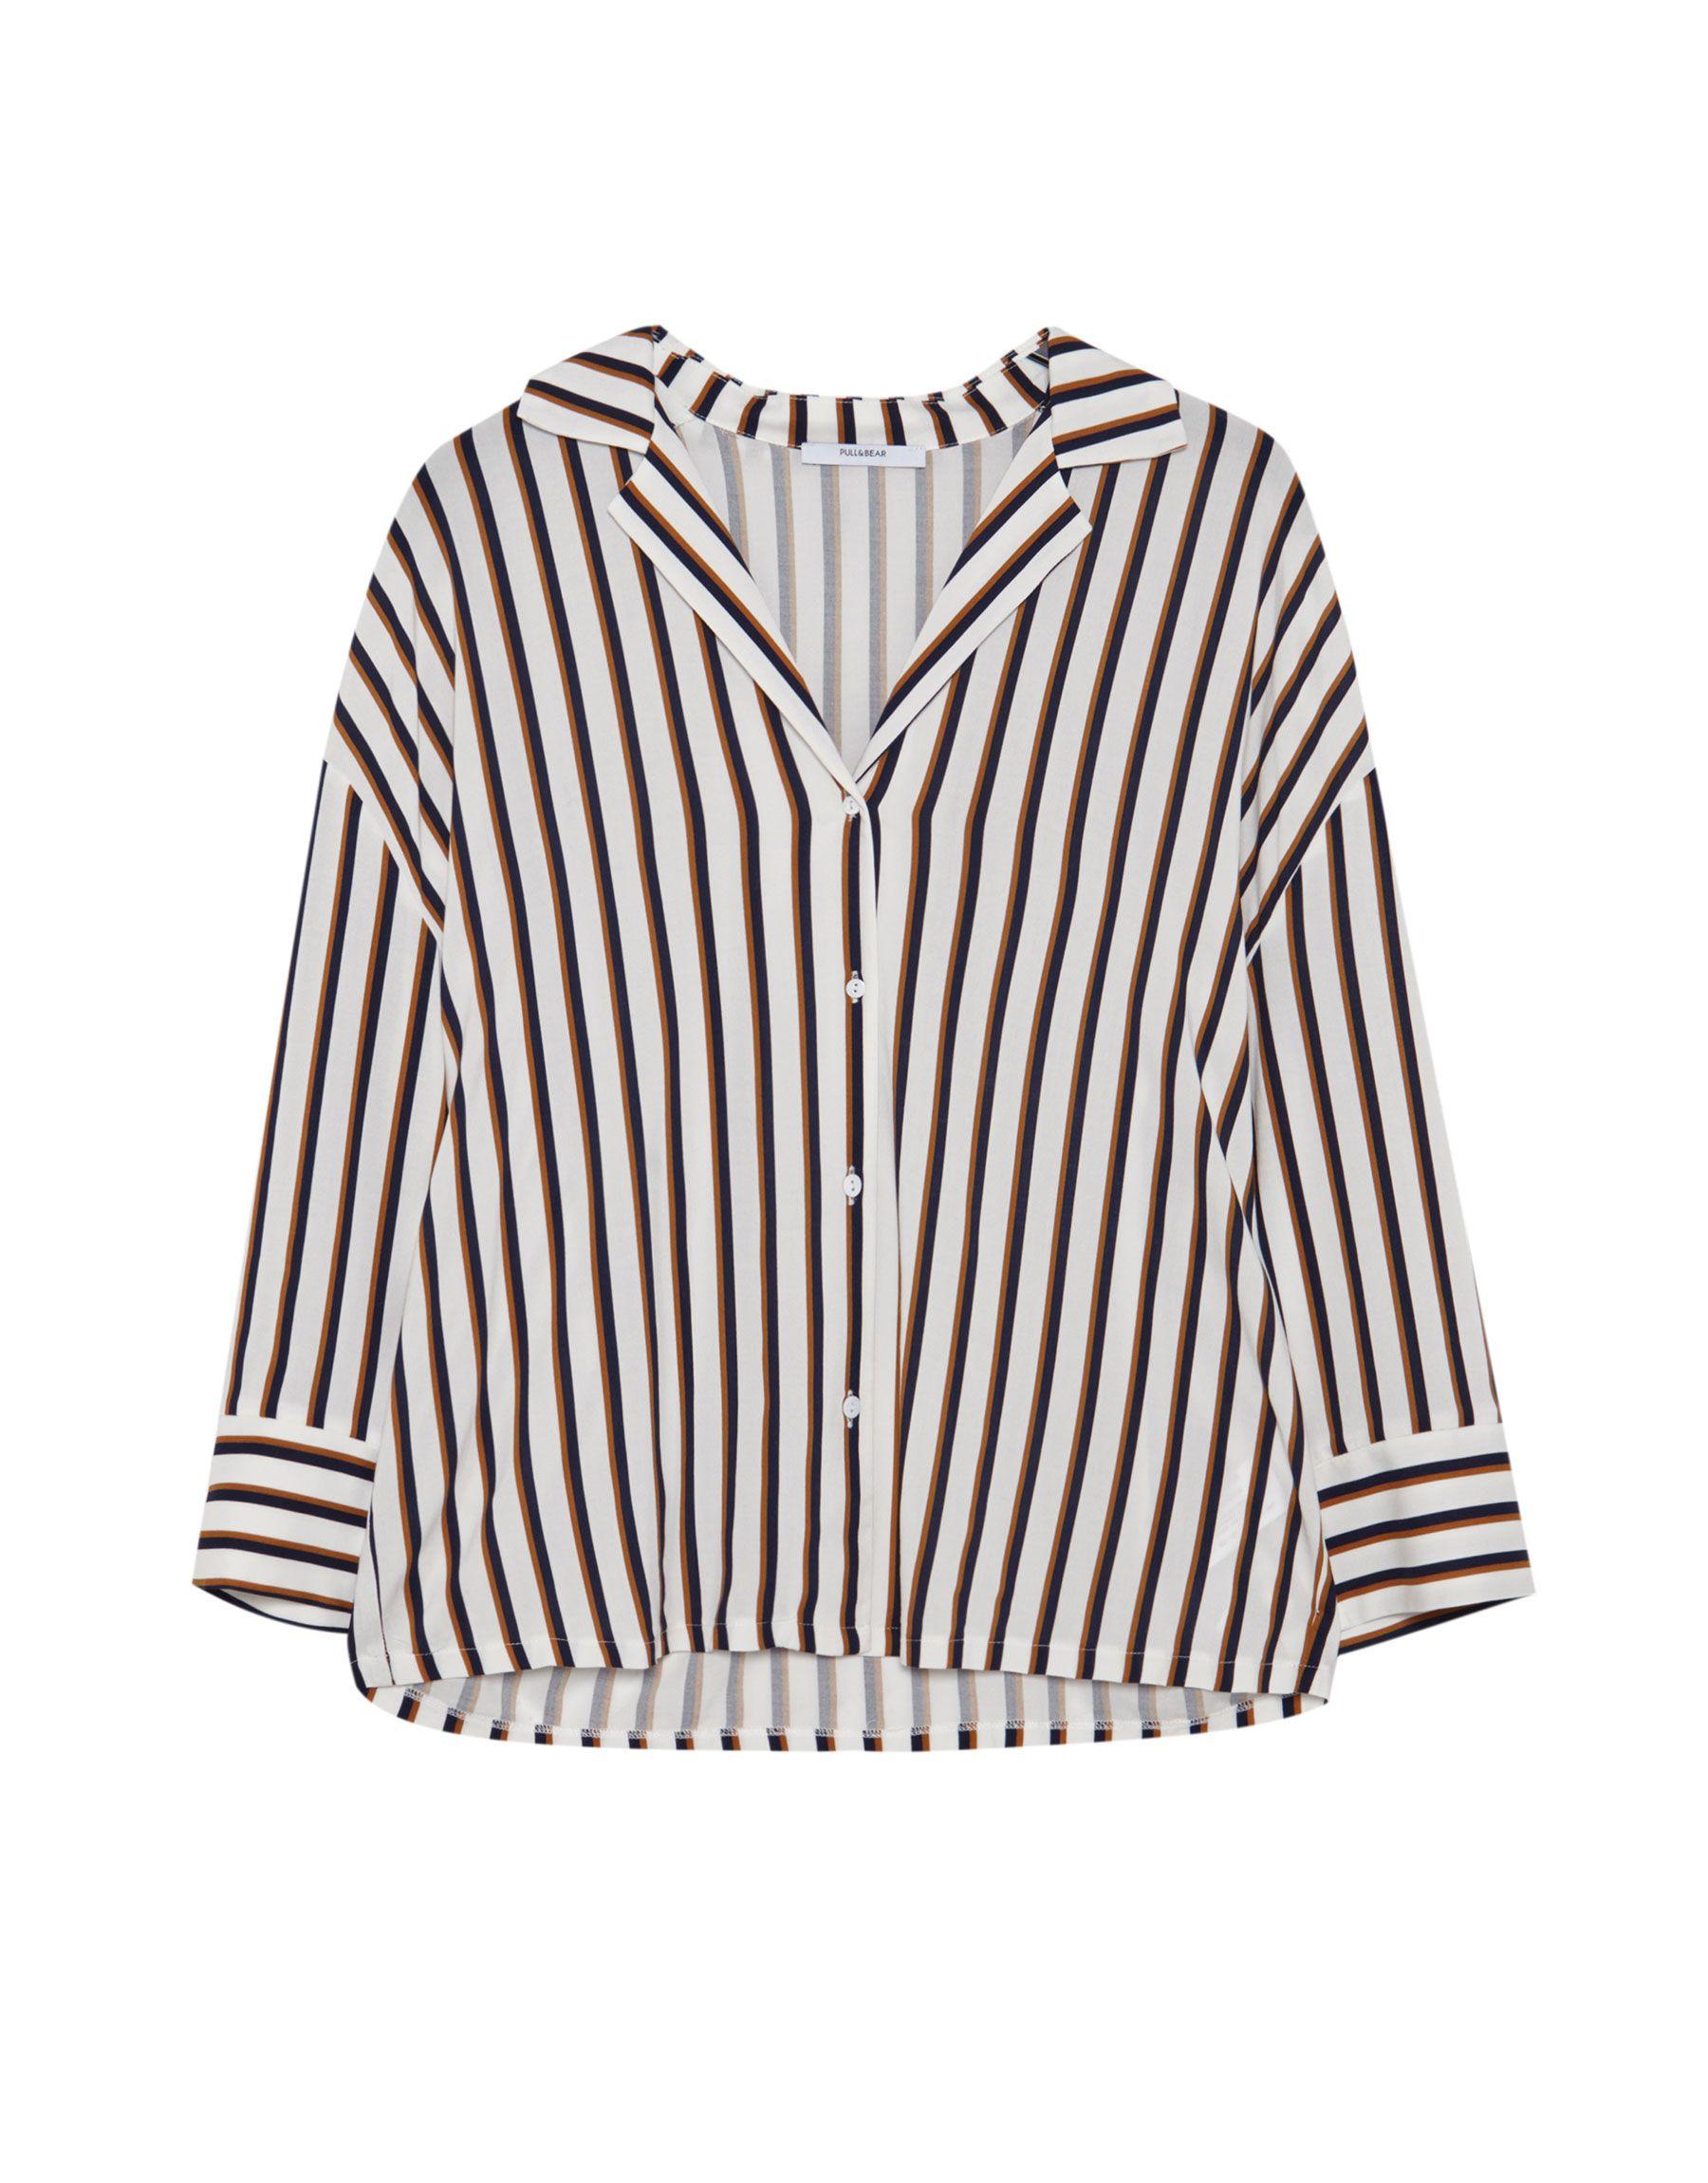 7cb357d3f8 Camisa cuello solapa rayas - Novedades - Mujer - PULL BEAR México ...